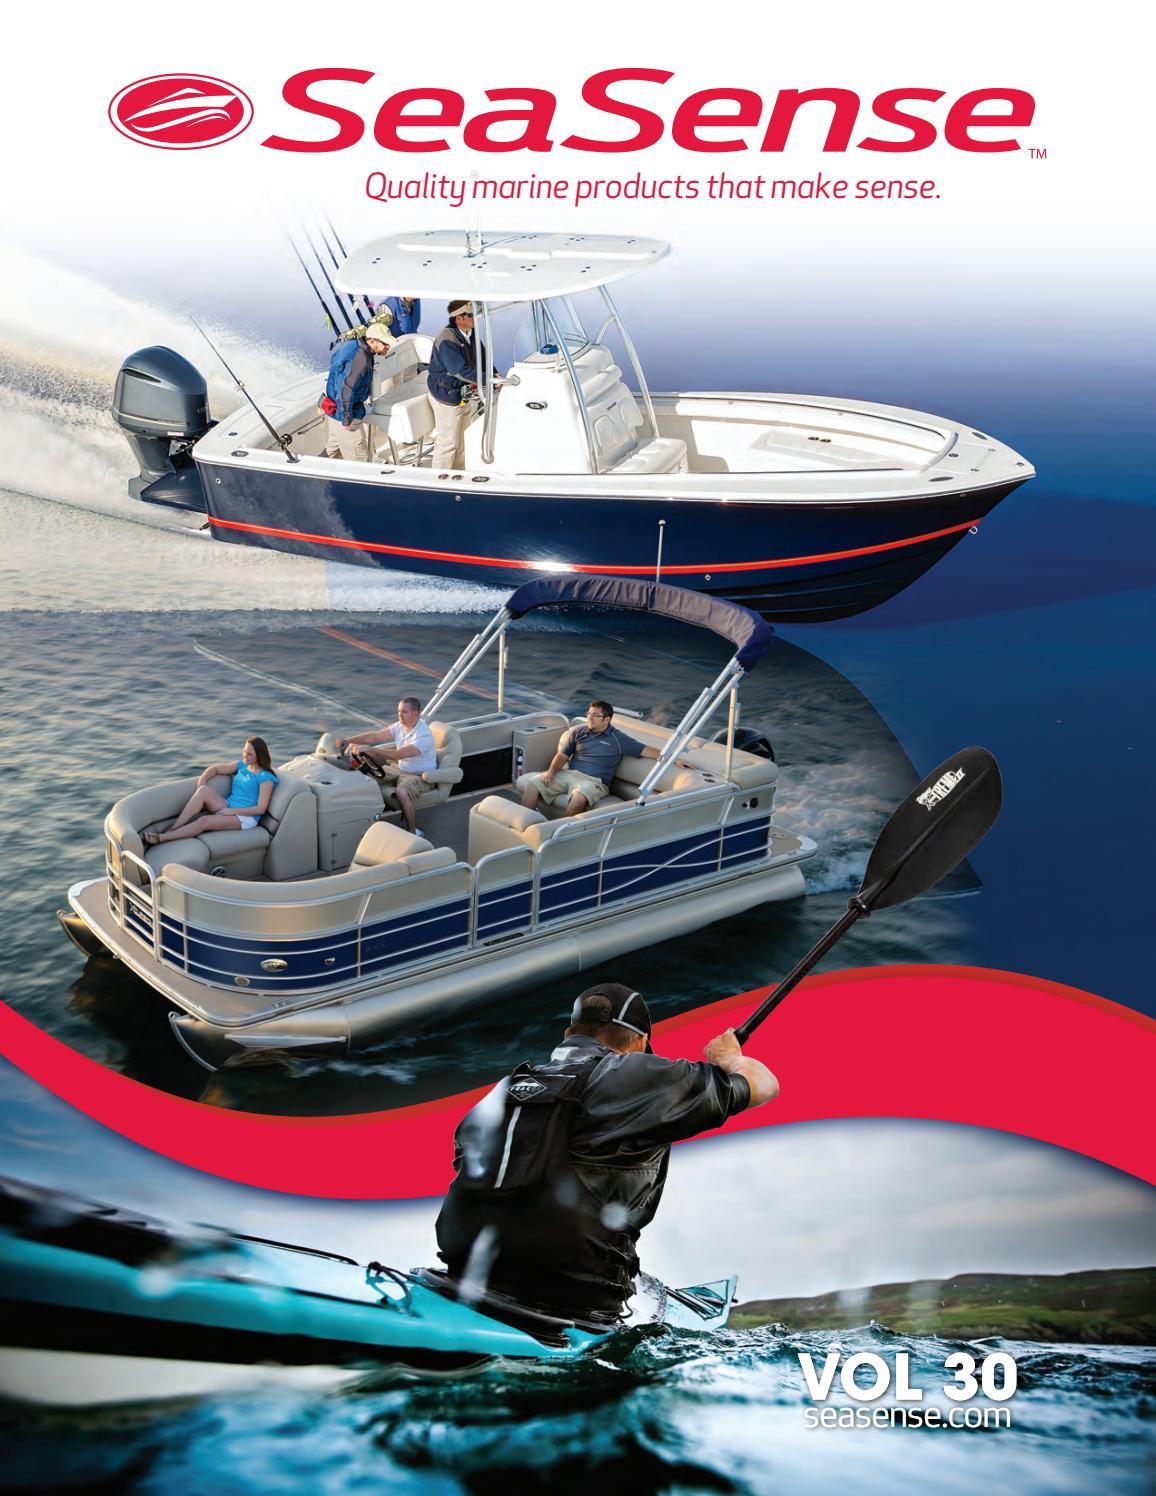 1200LB EDC with 20-Foot Strap SeaSense Trailer Winch